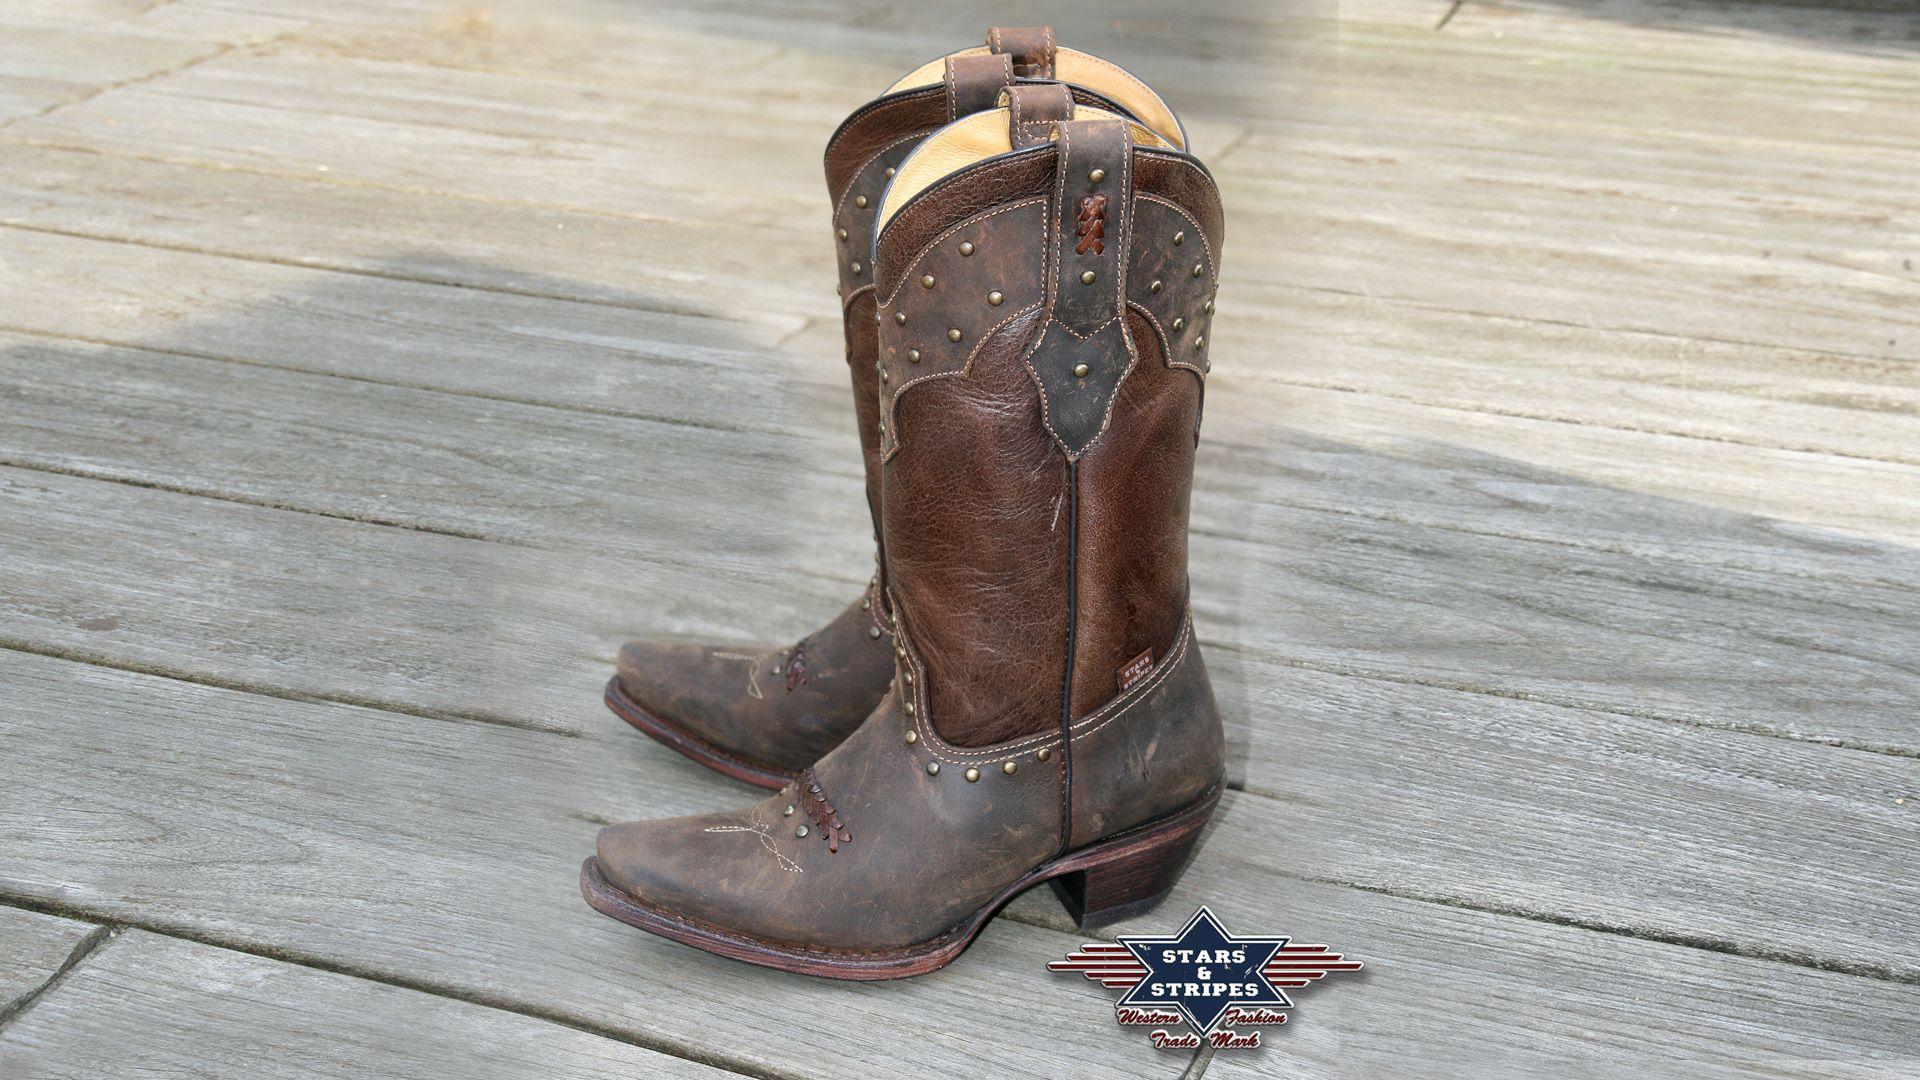 WBL-27 :: Silverado Indian Western Store - Sendra Boots Online